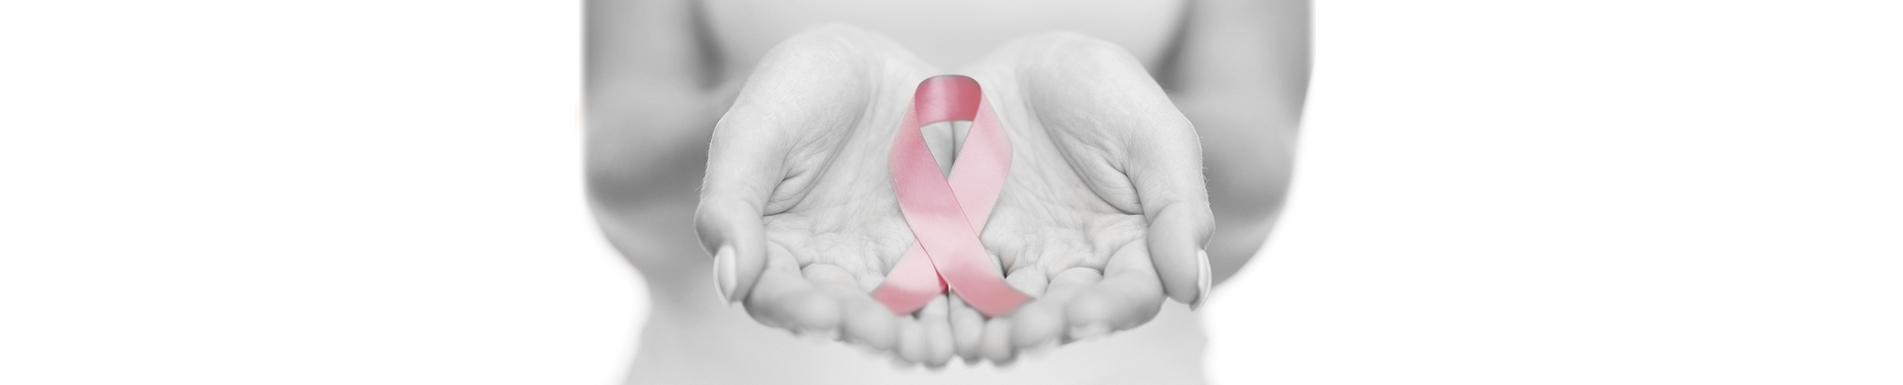 cancer-sein-docteur-luini-chirurgie-esthetique-antibes